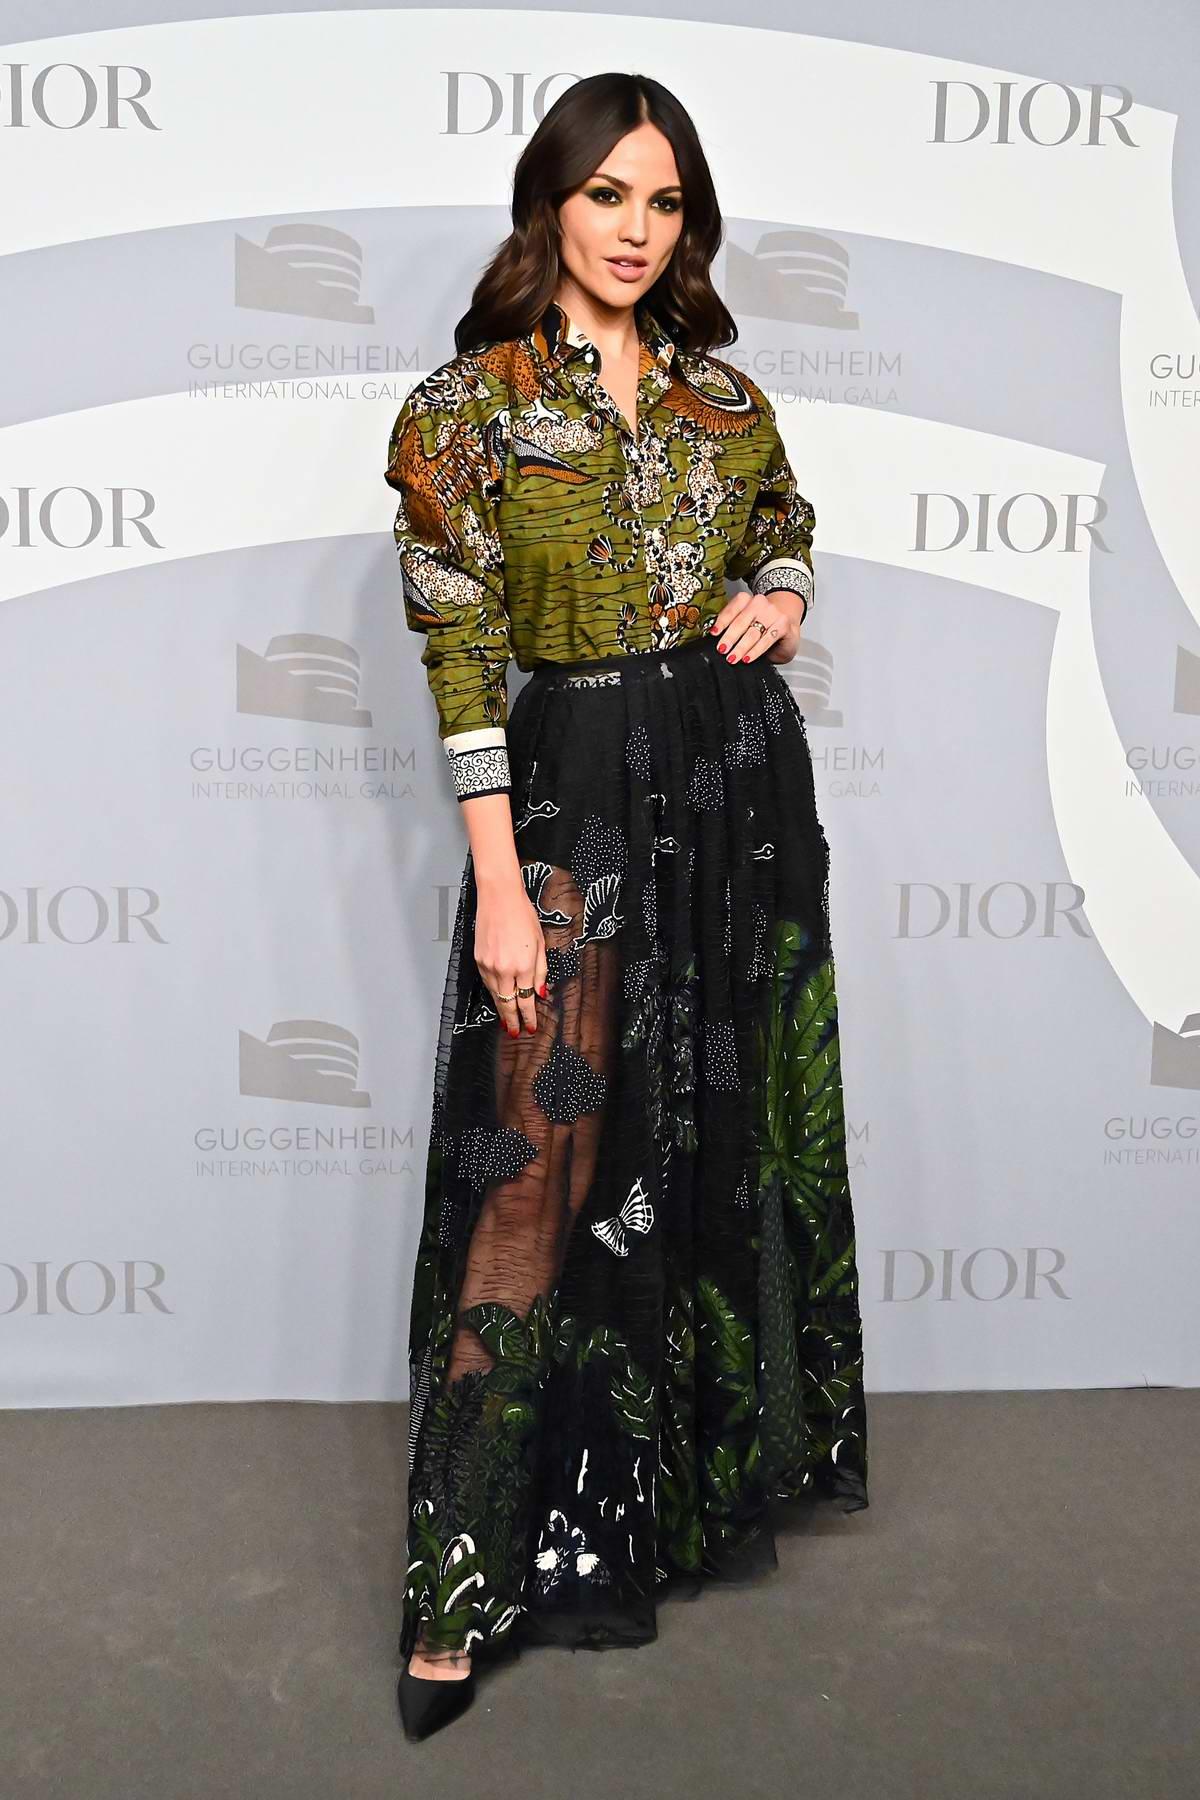 Eiza Gonzalez attends the Guggenheim International Gala at The Guggenheim in New York City